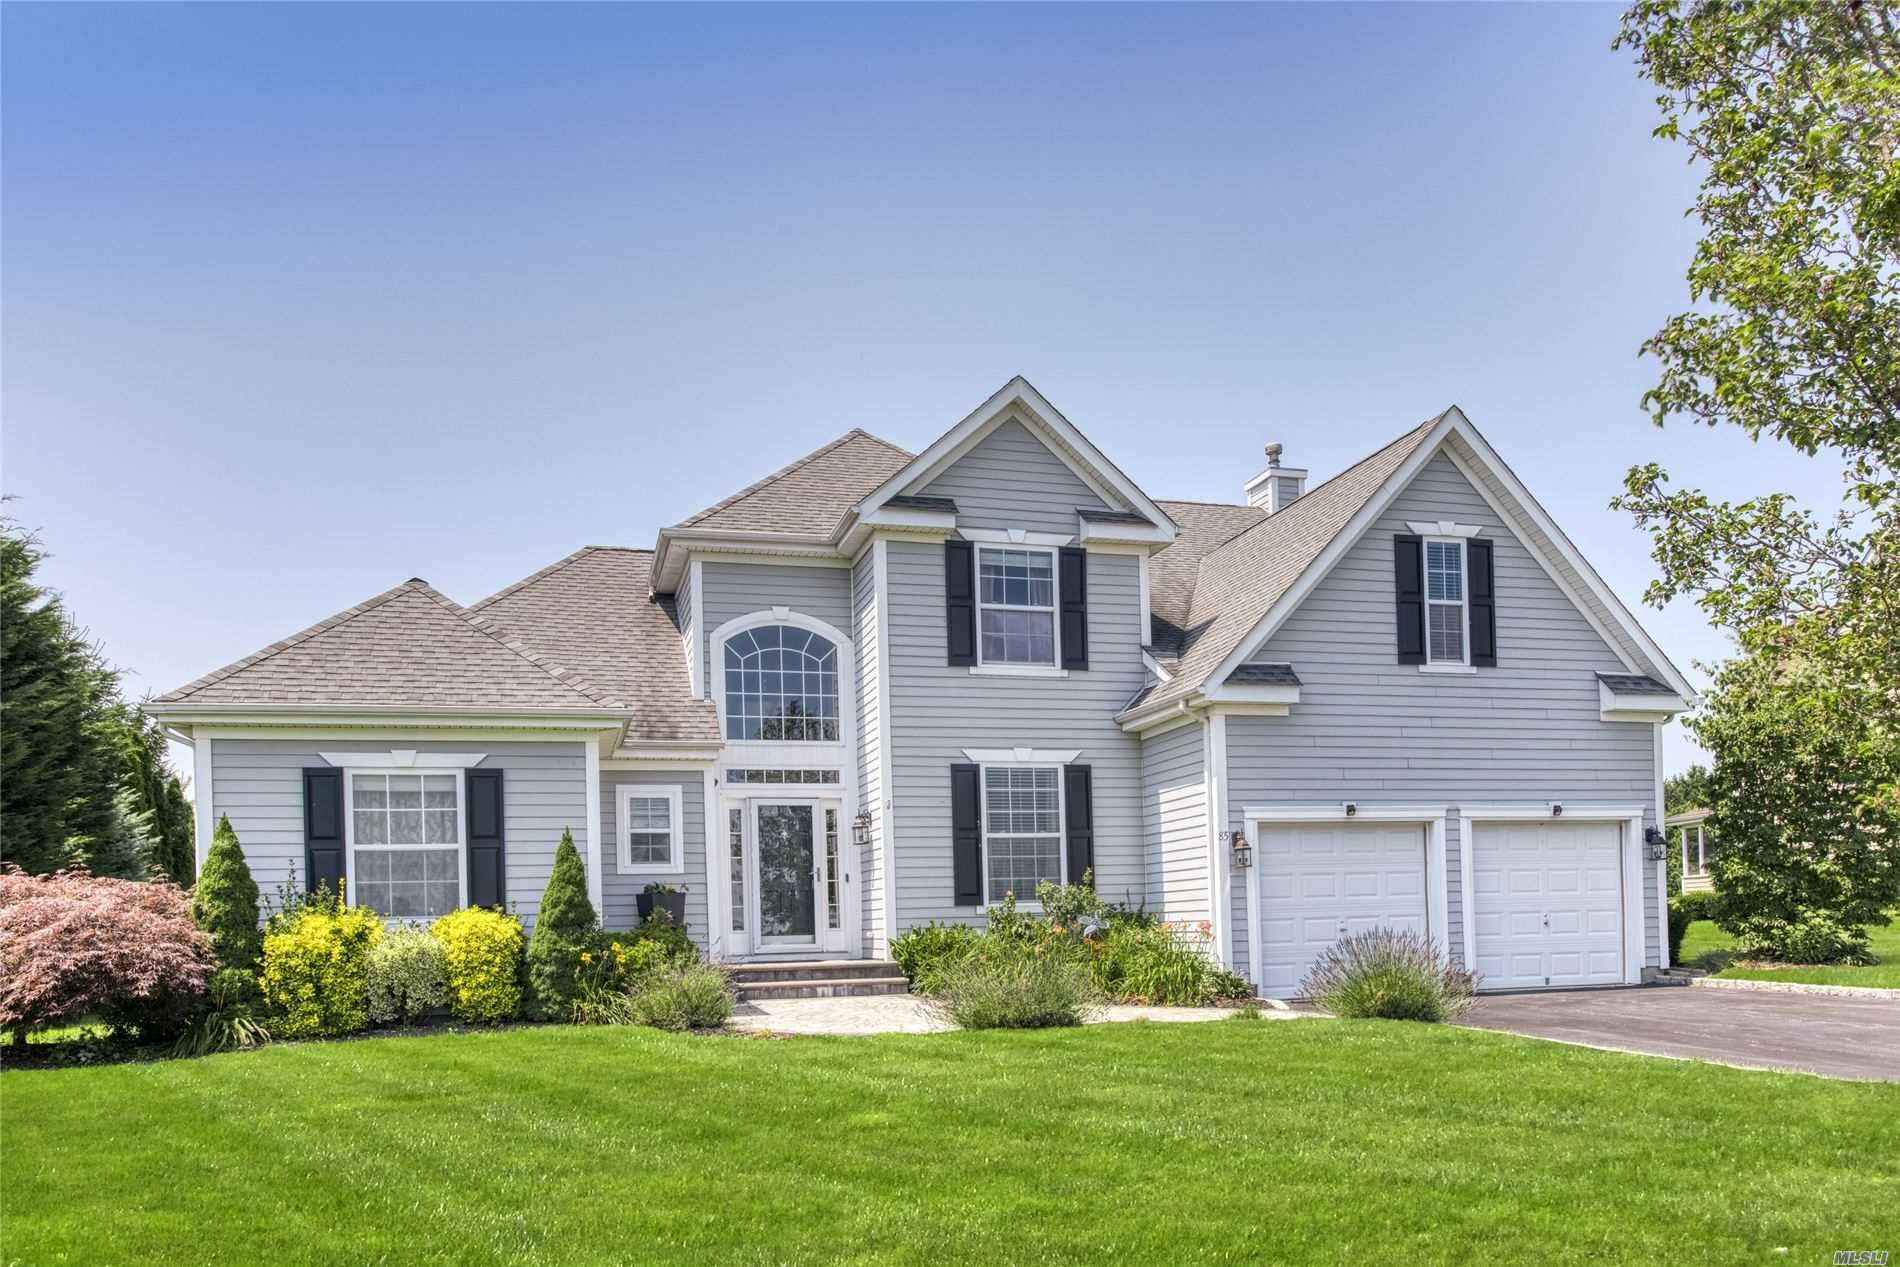 85 Windflower Lane, Riverhead, NY 11901 - MLS#: 3234227